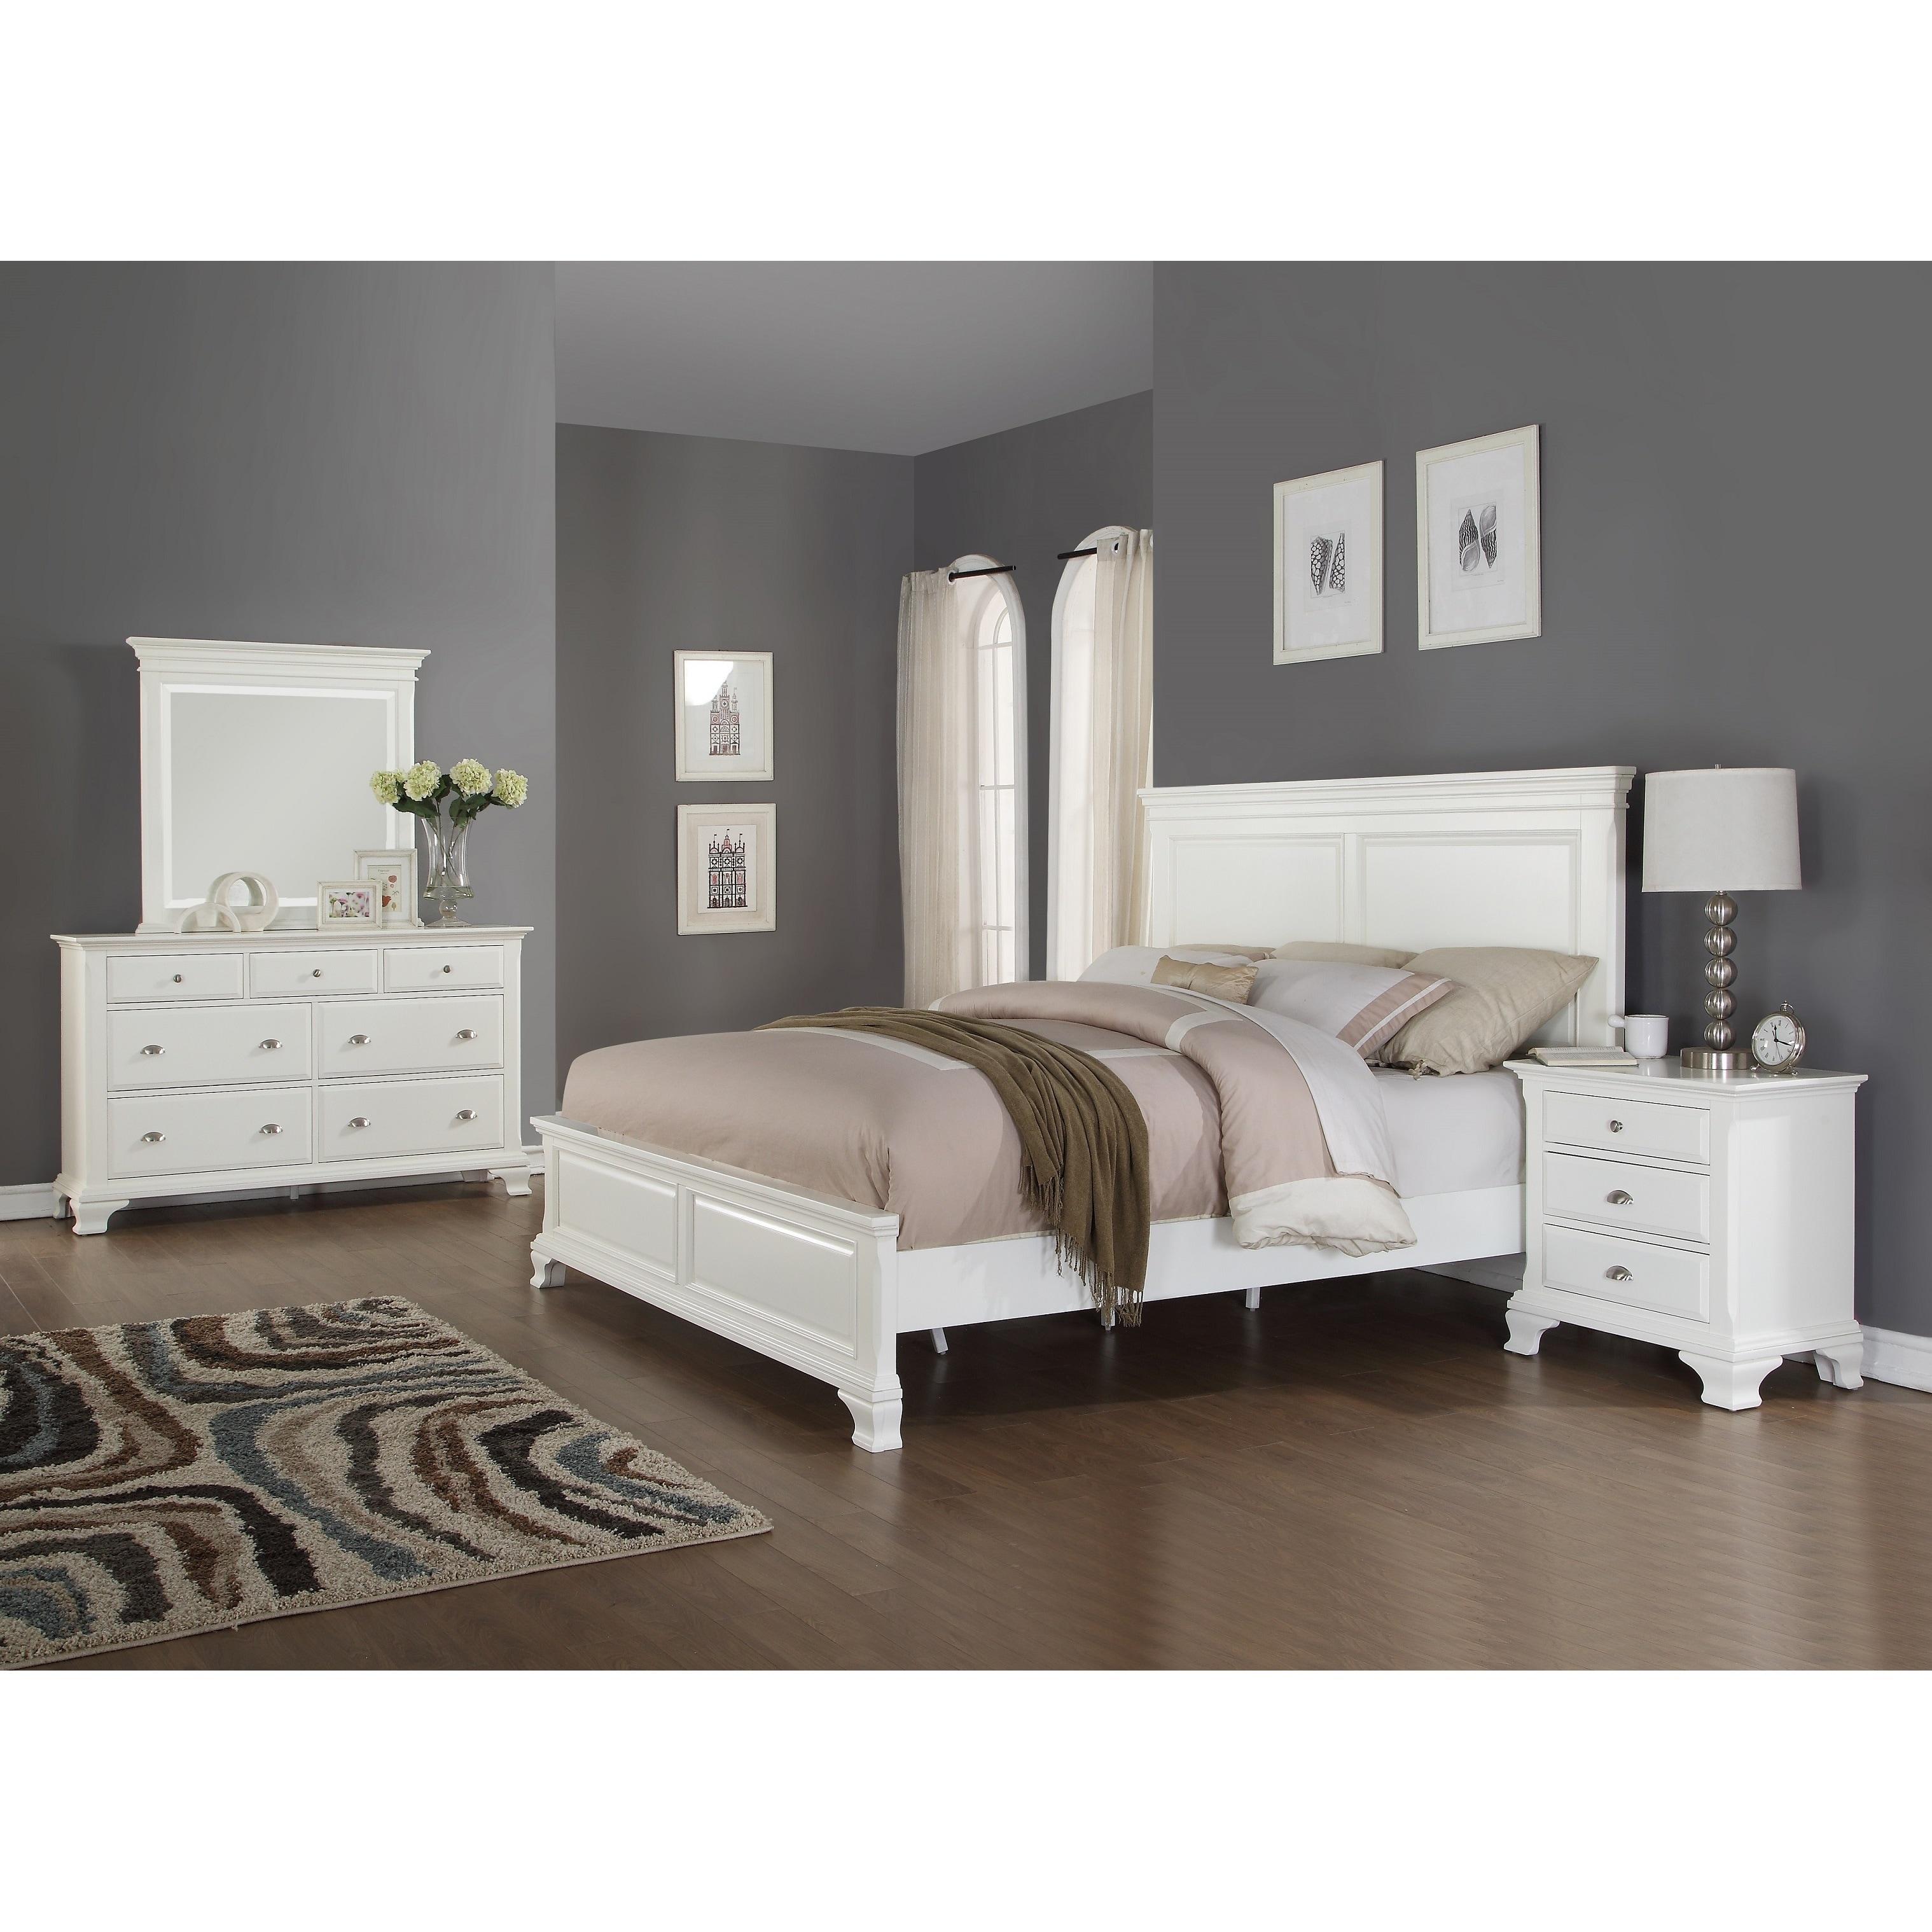 Laveno 012 White Wood Bedroom Furniture Set, Includes Que...